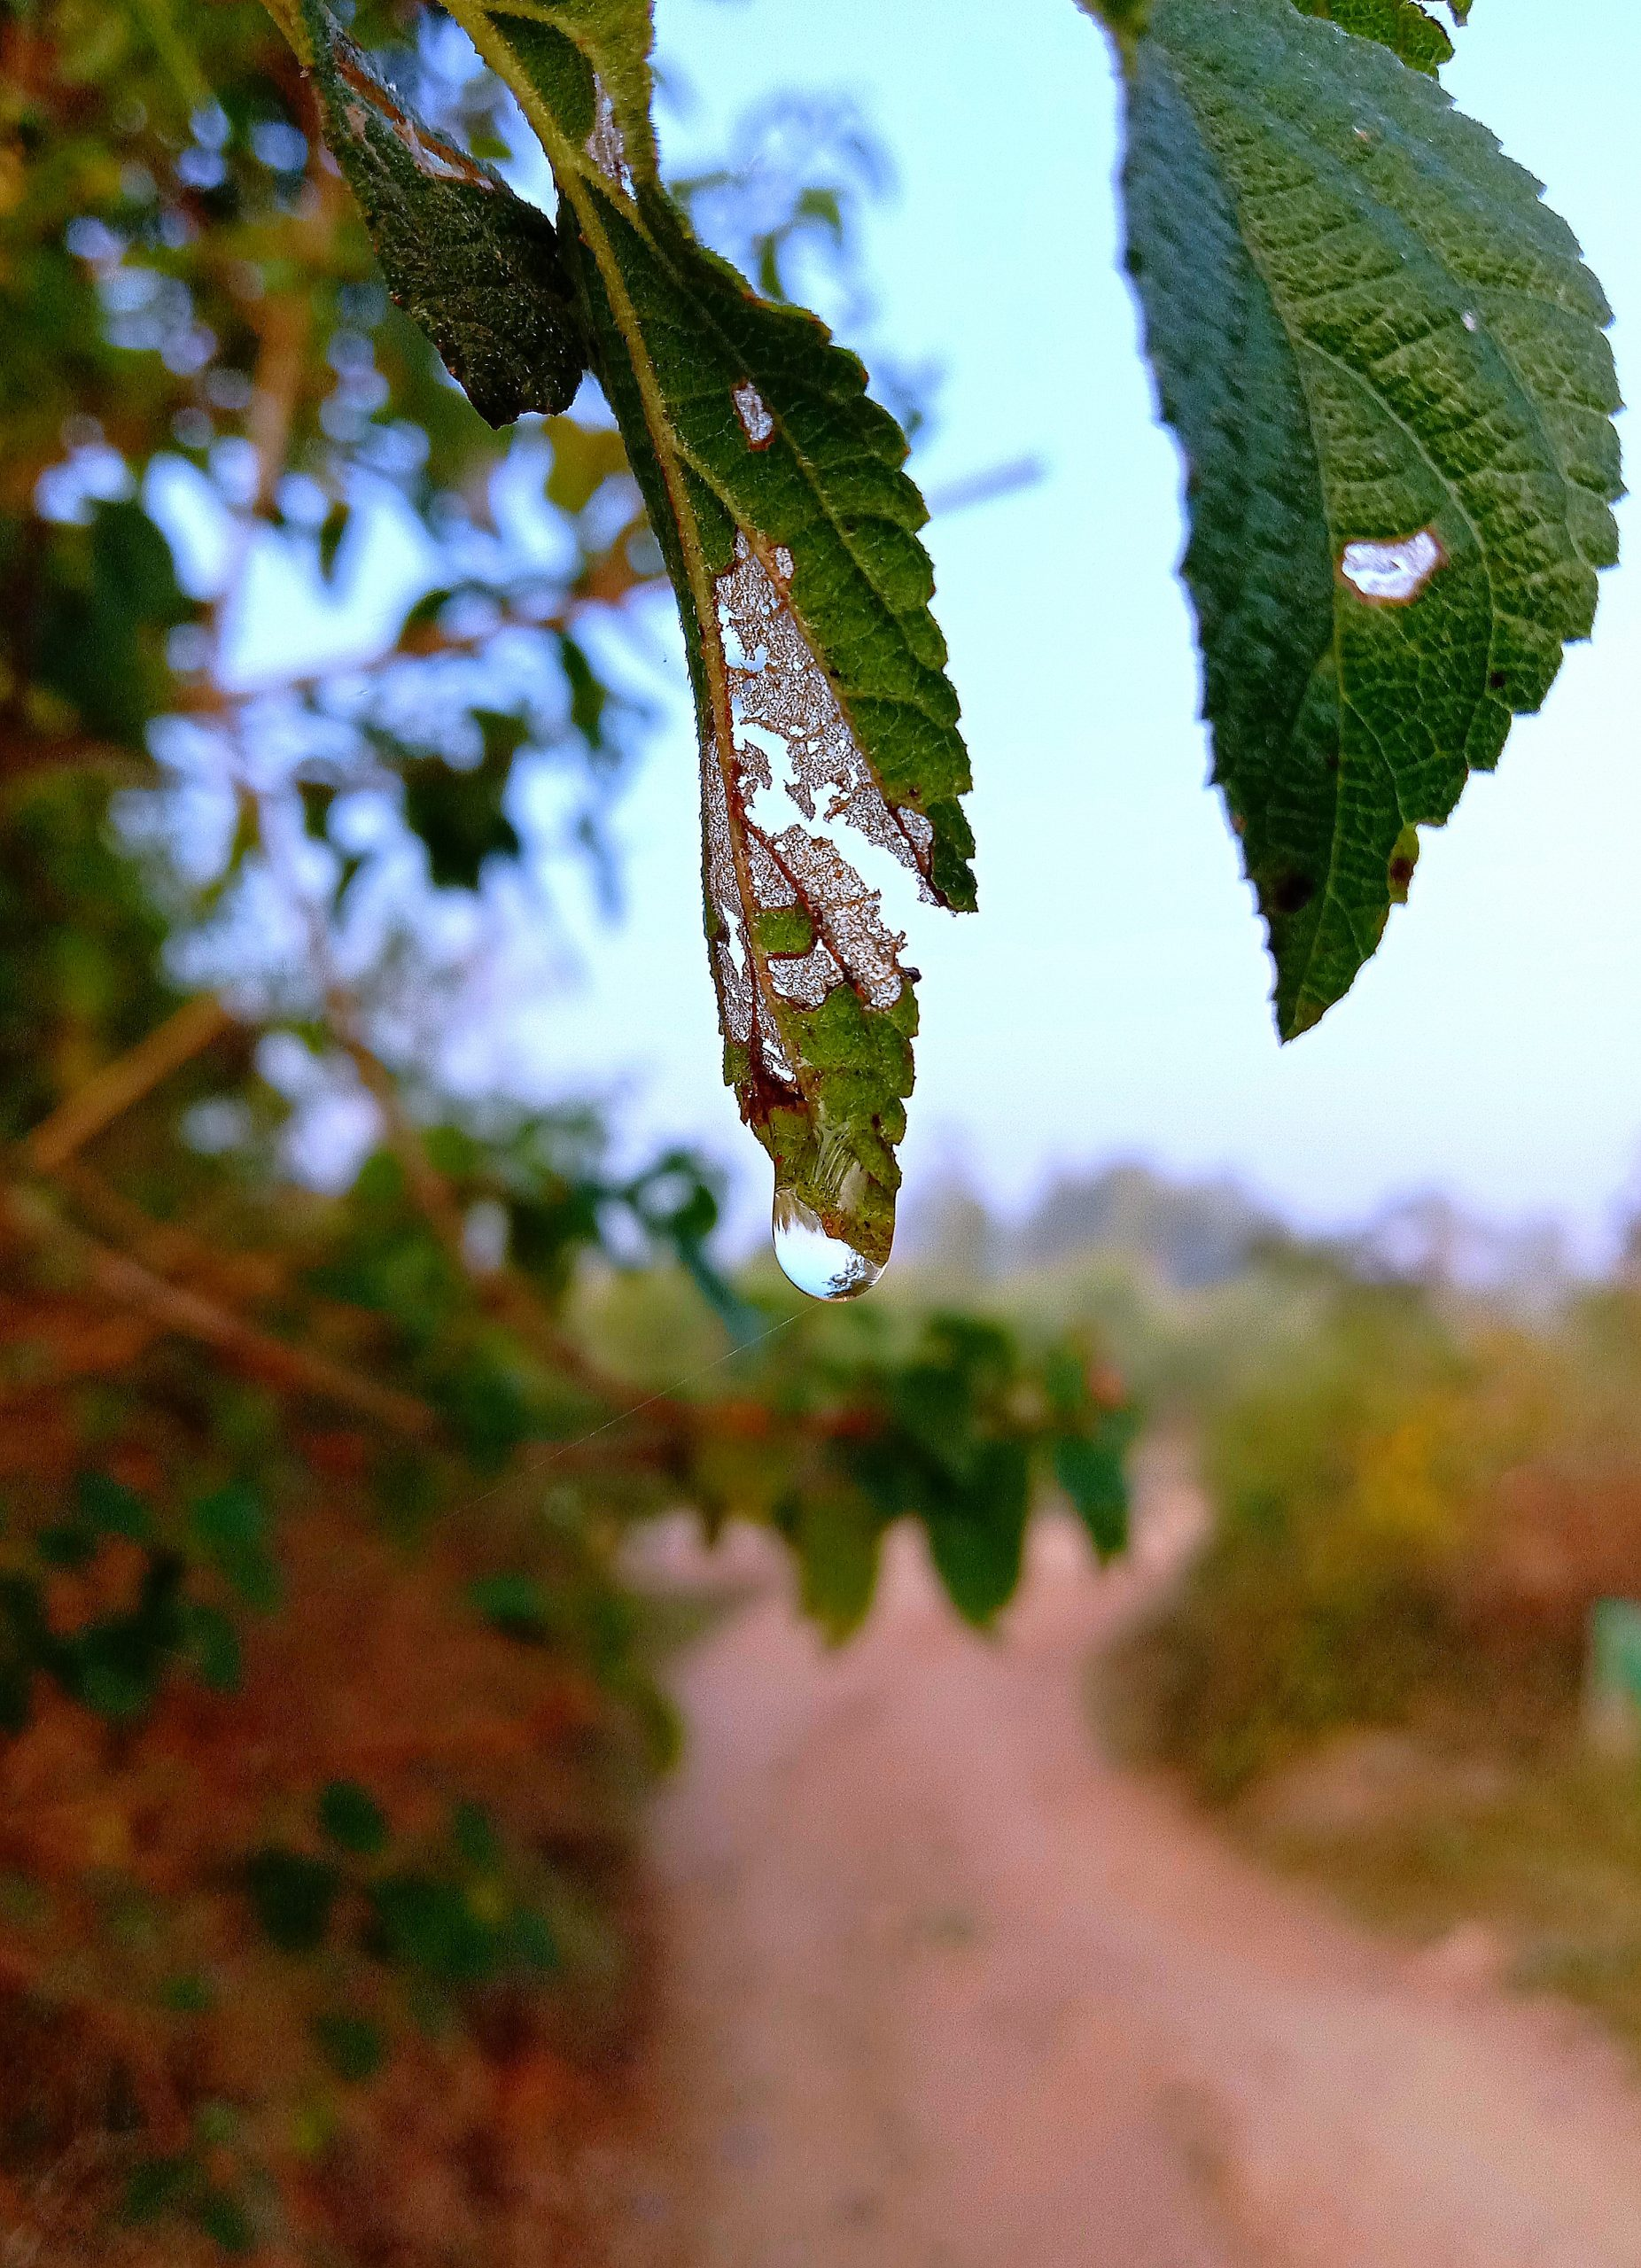 Water drop on plant leaf